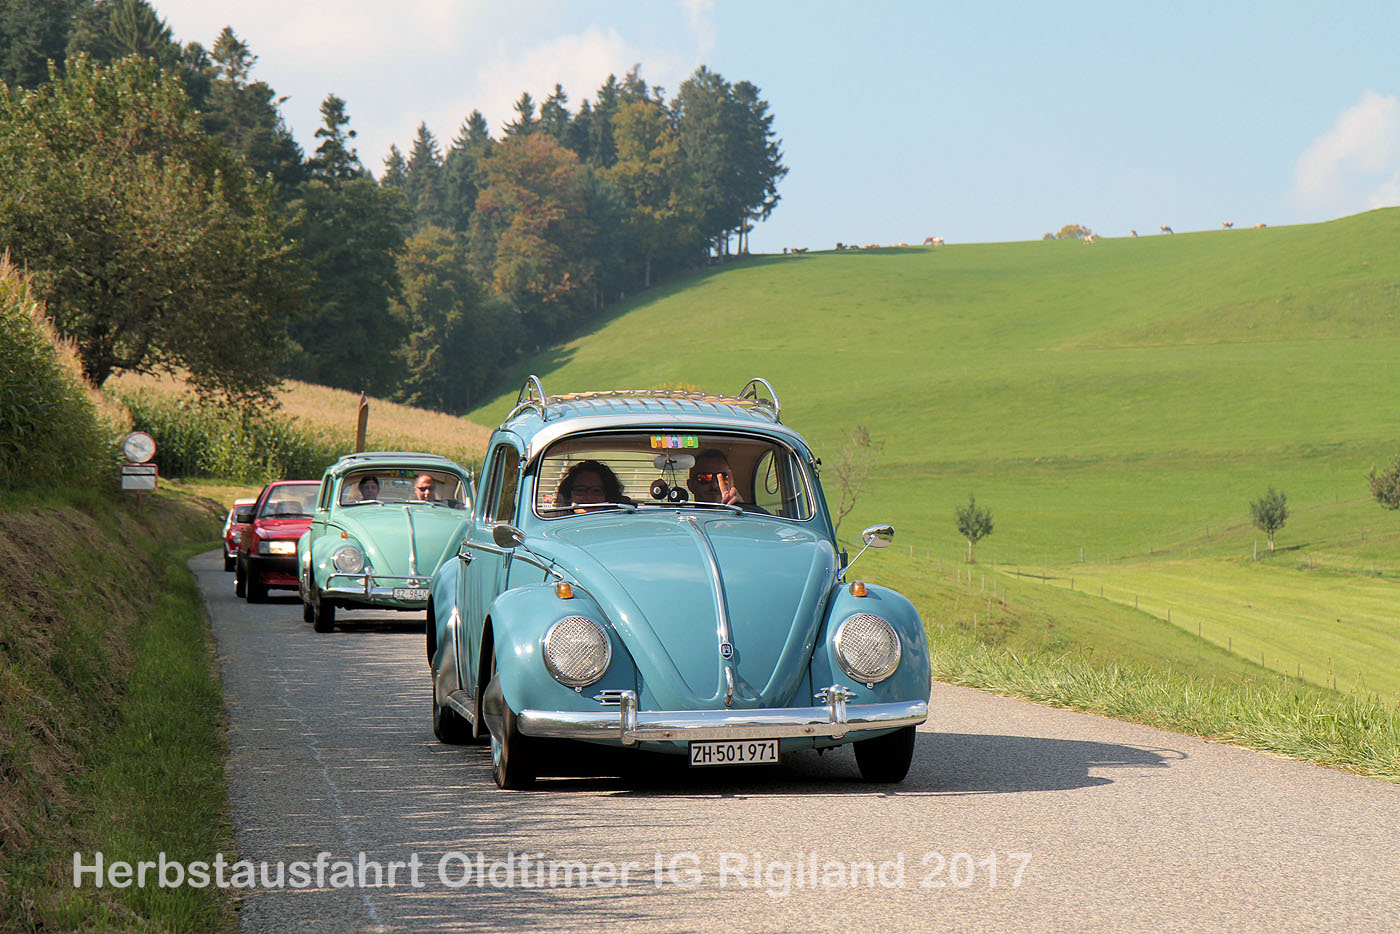 Herbstausfahrt der Oldtimer IG Rigiland 2017